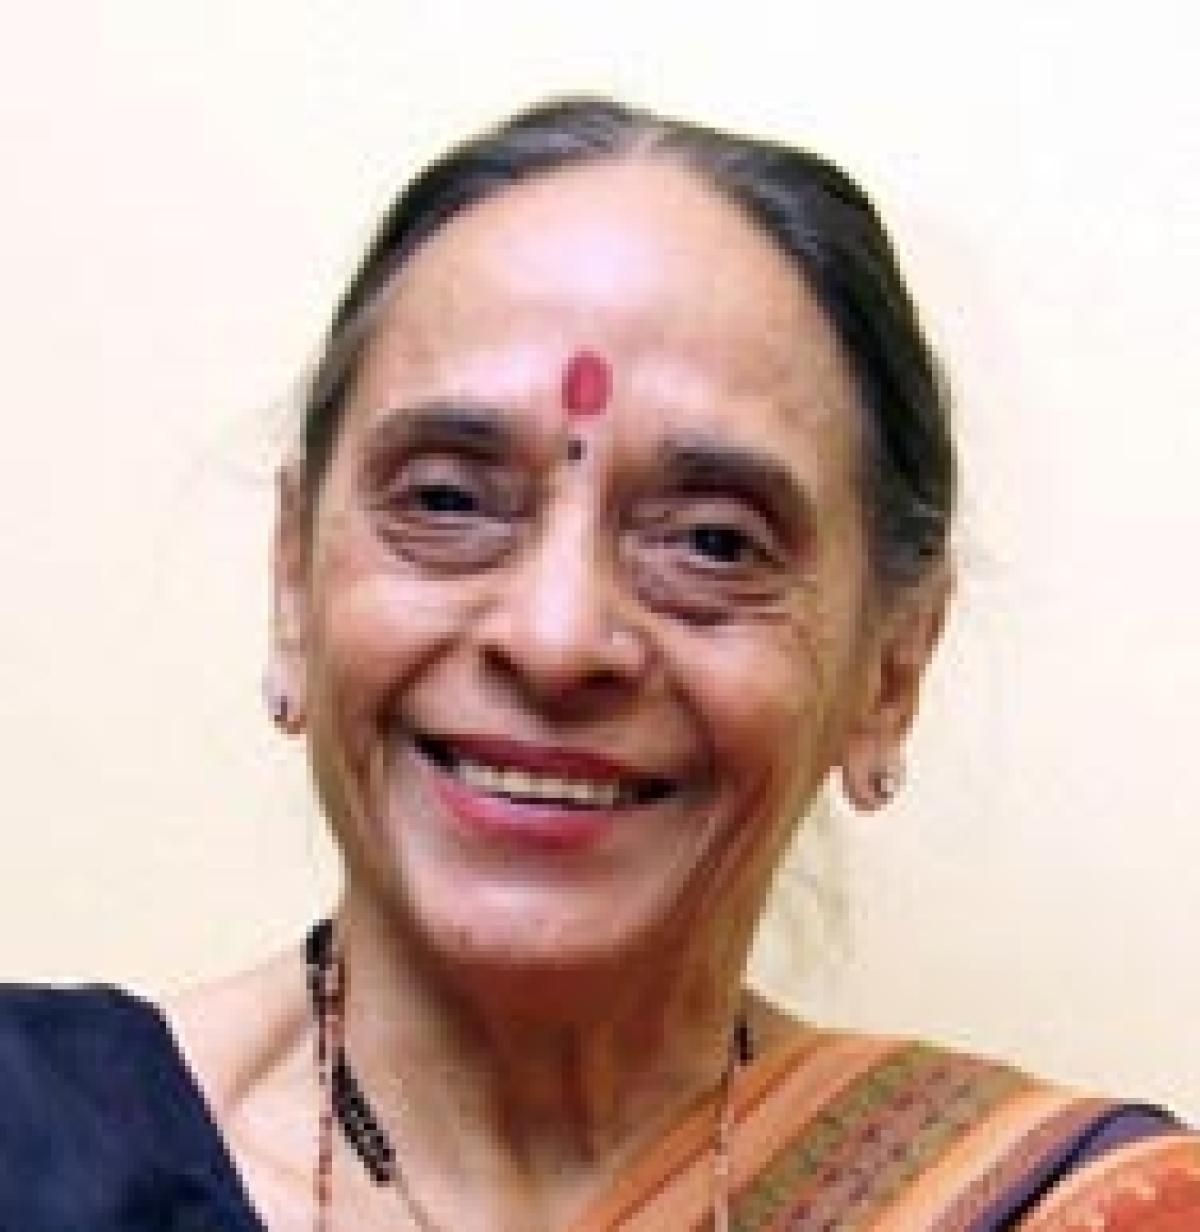 Leila Seth, first woman chief justice speaks of gender bias